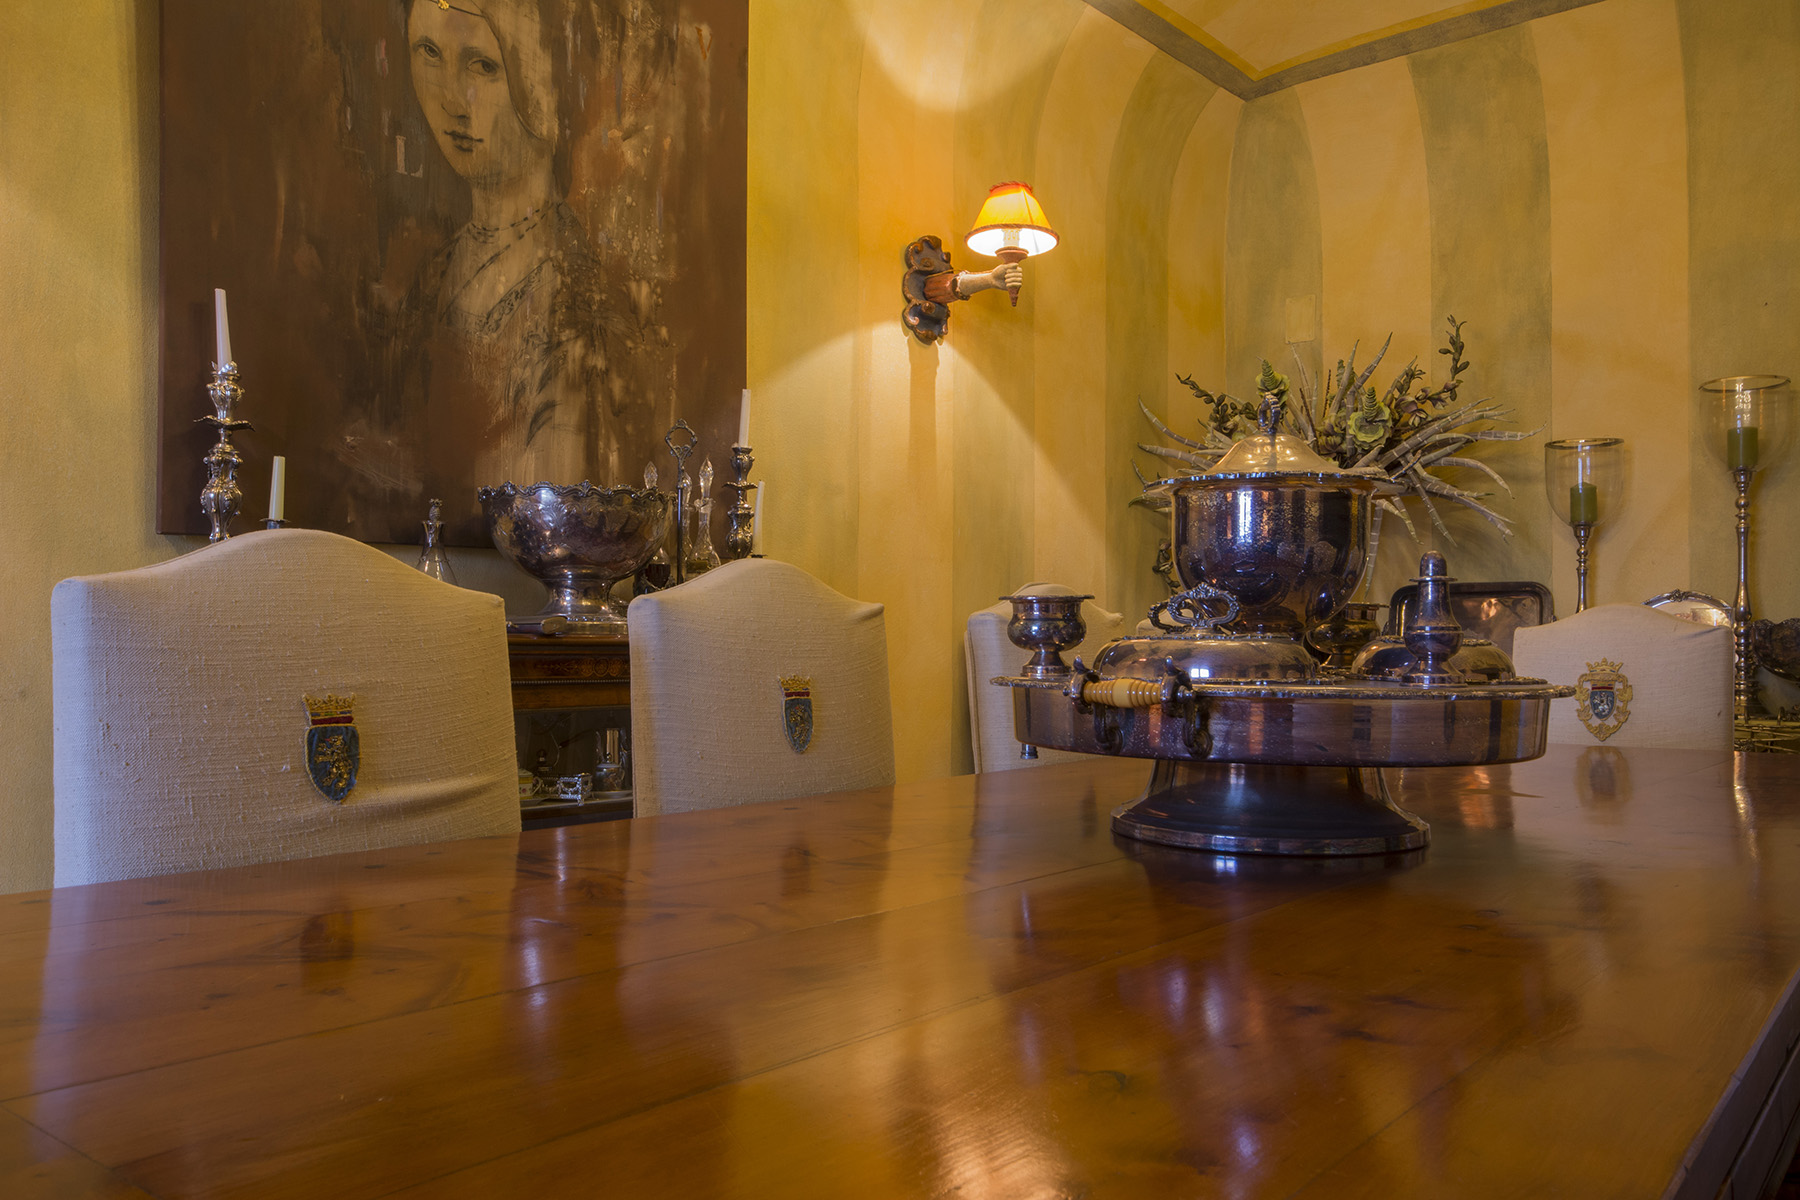 Additional photo for property listing at Merveilleuse appartement sur le Lungarno de Pisa Pisa, Pisa Italie